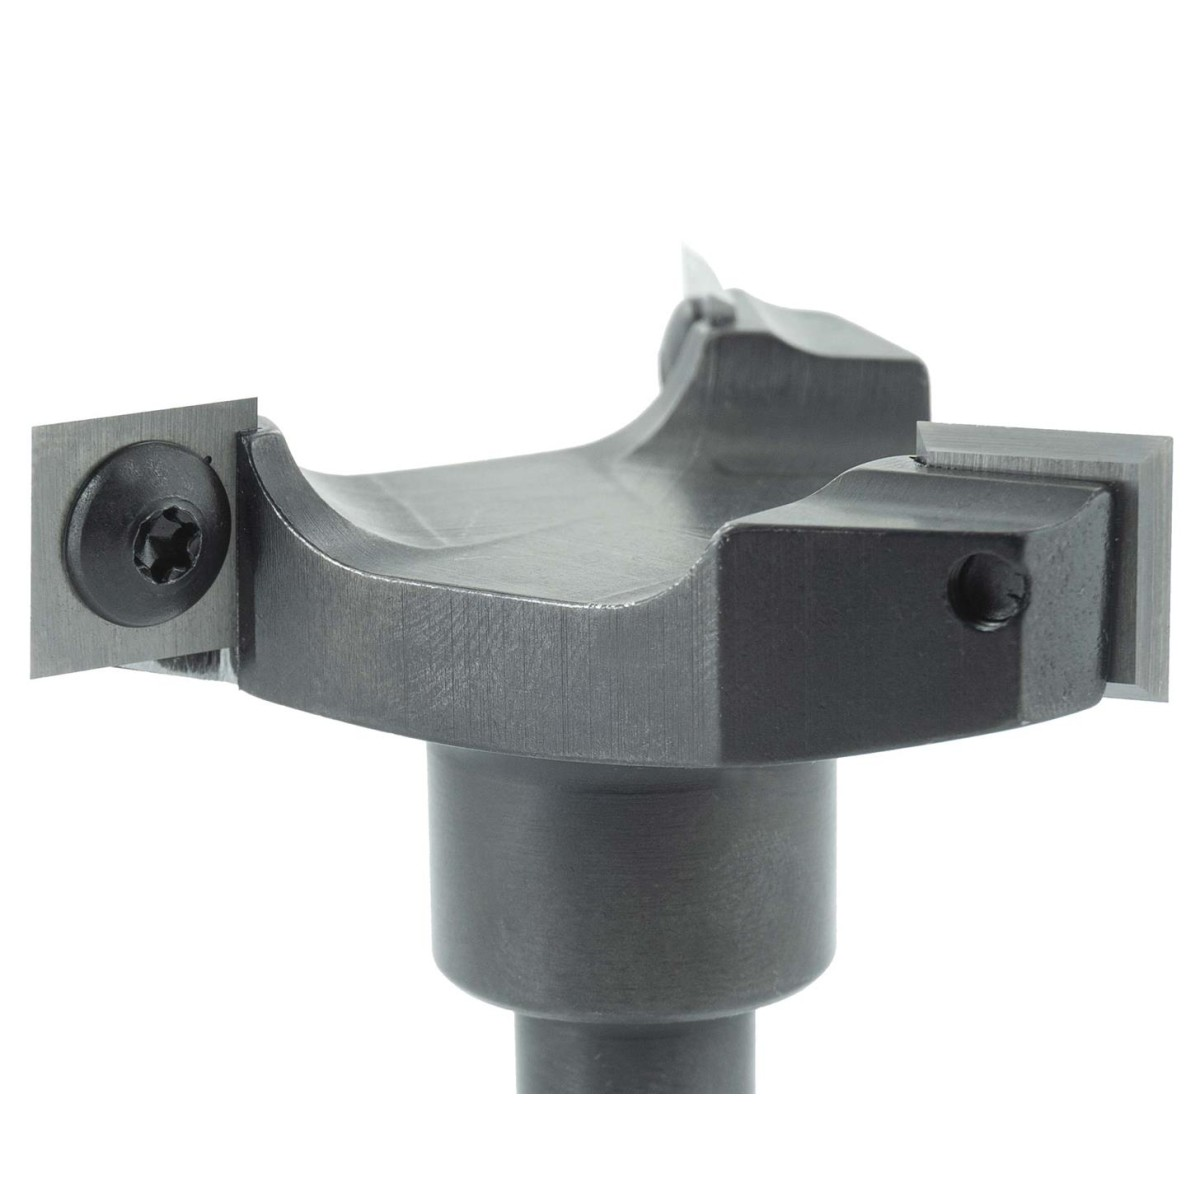 47 mm C A ENT 16465 Flachd/übelfr/äser HW D 40 mm mit 3 Kugellager Schaft HM 12 mm Durchmesser B 3,97 mm